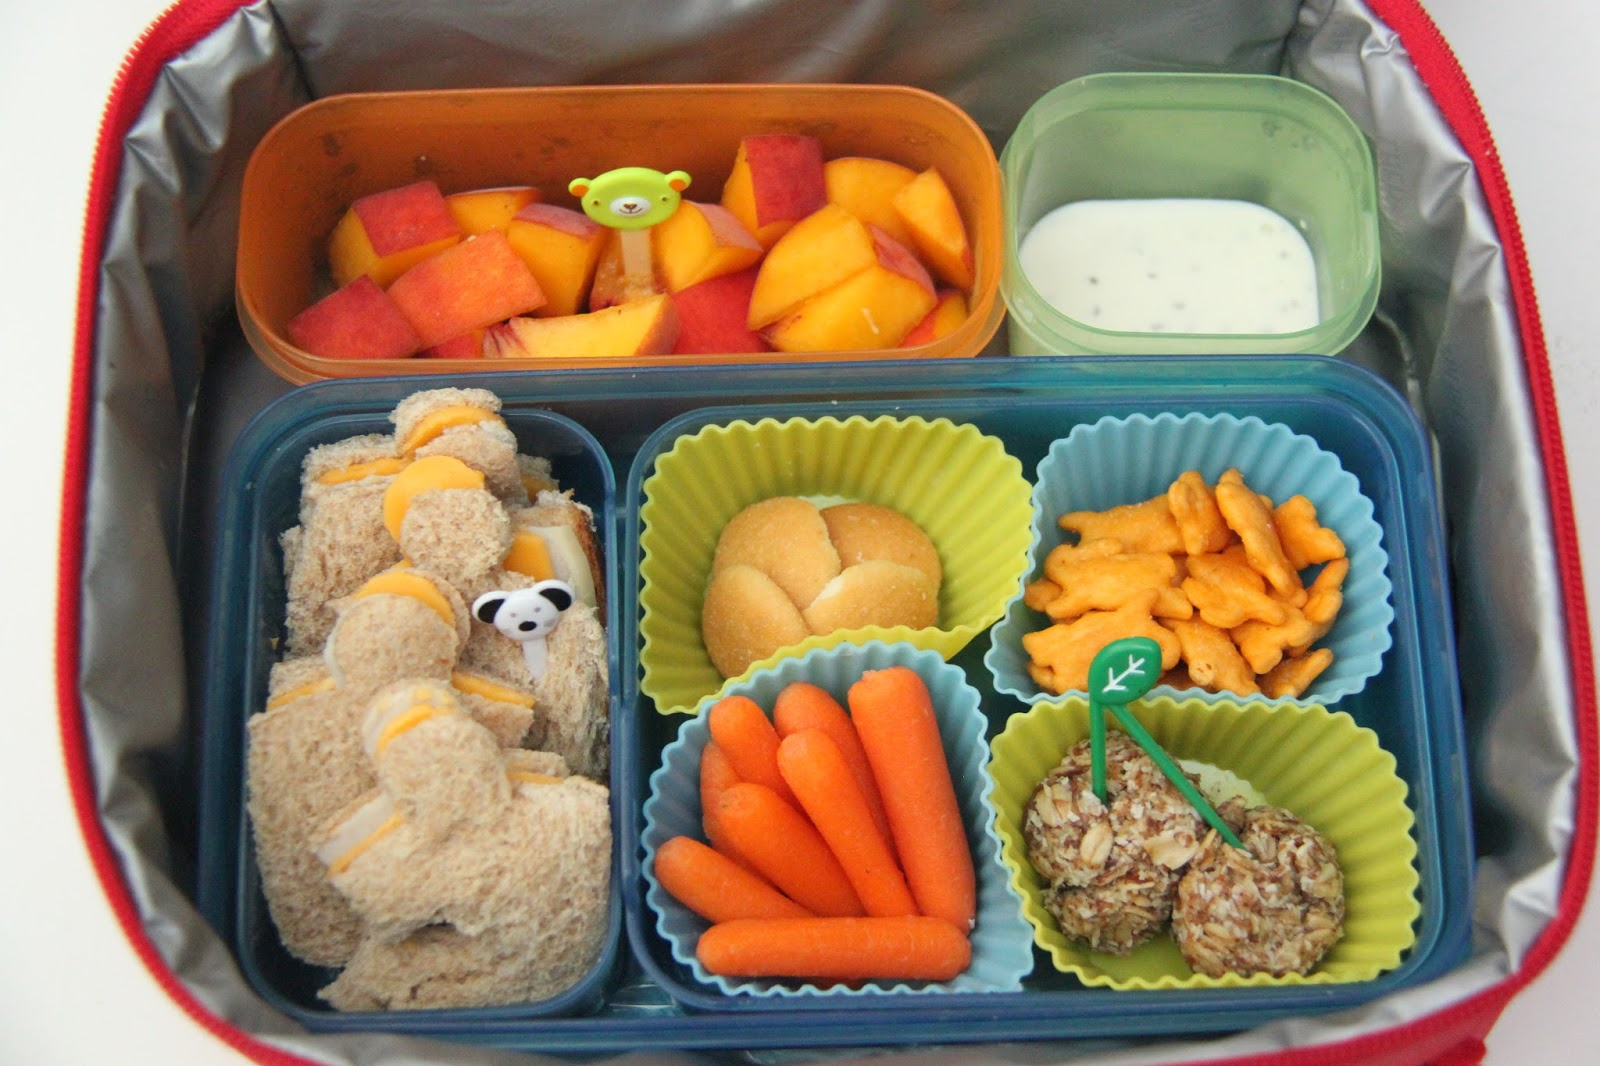 bento lunch ideas week 1 smashed peas and carrots bloglovin. Black Bedroom Furniture Sets. Home Design Ideas